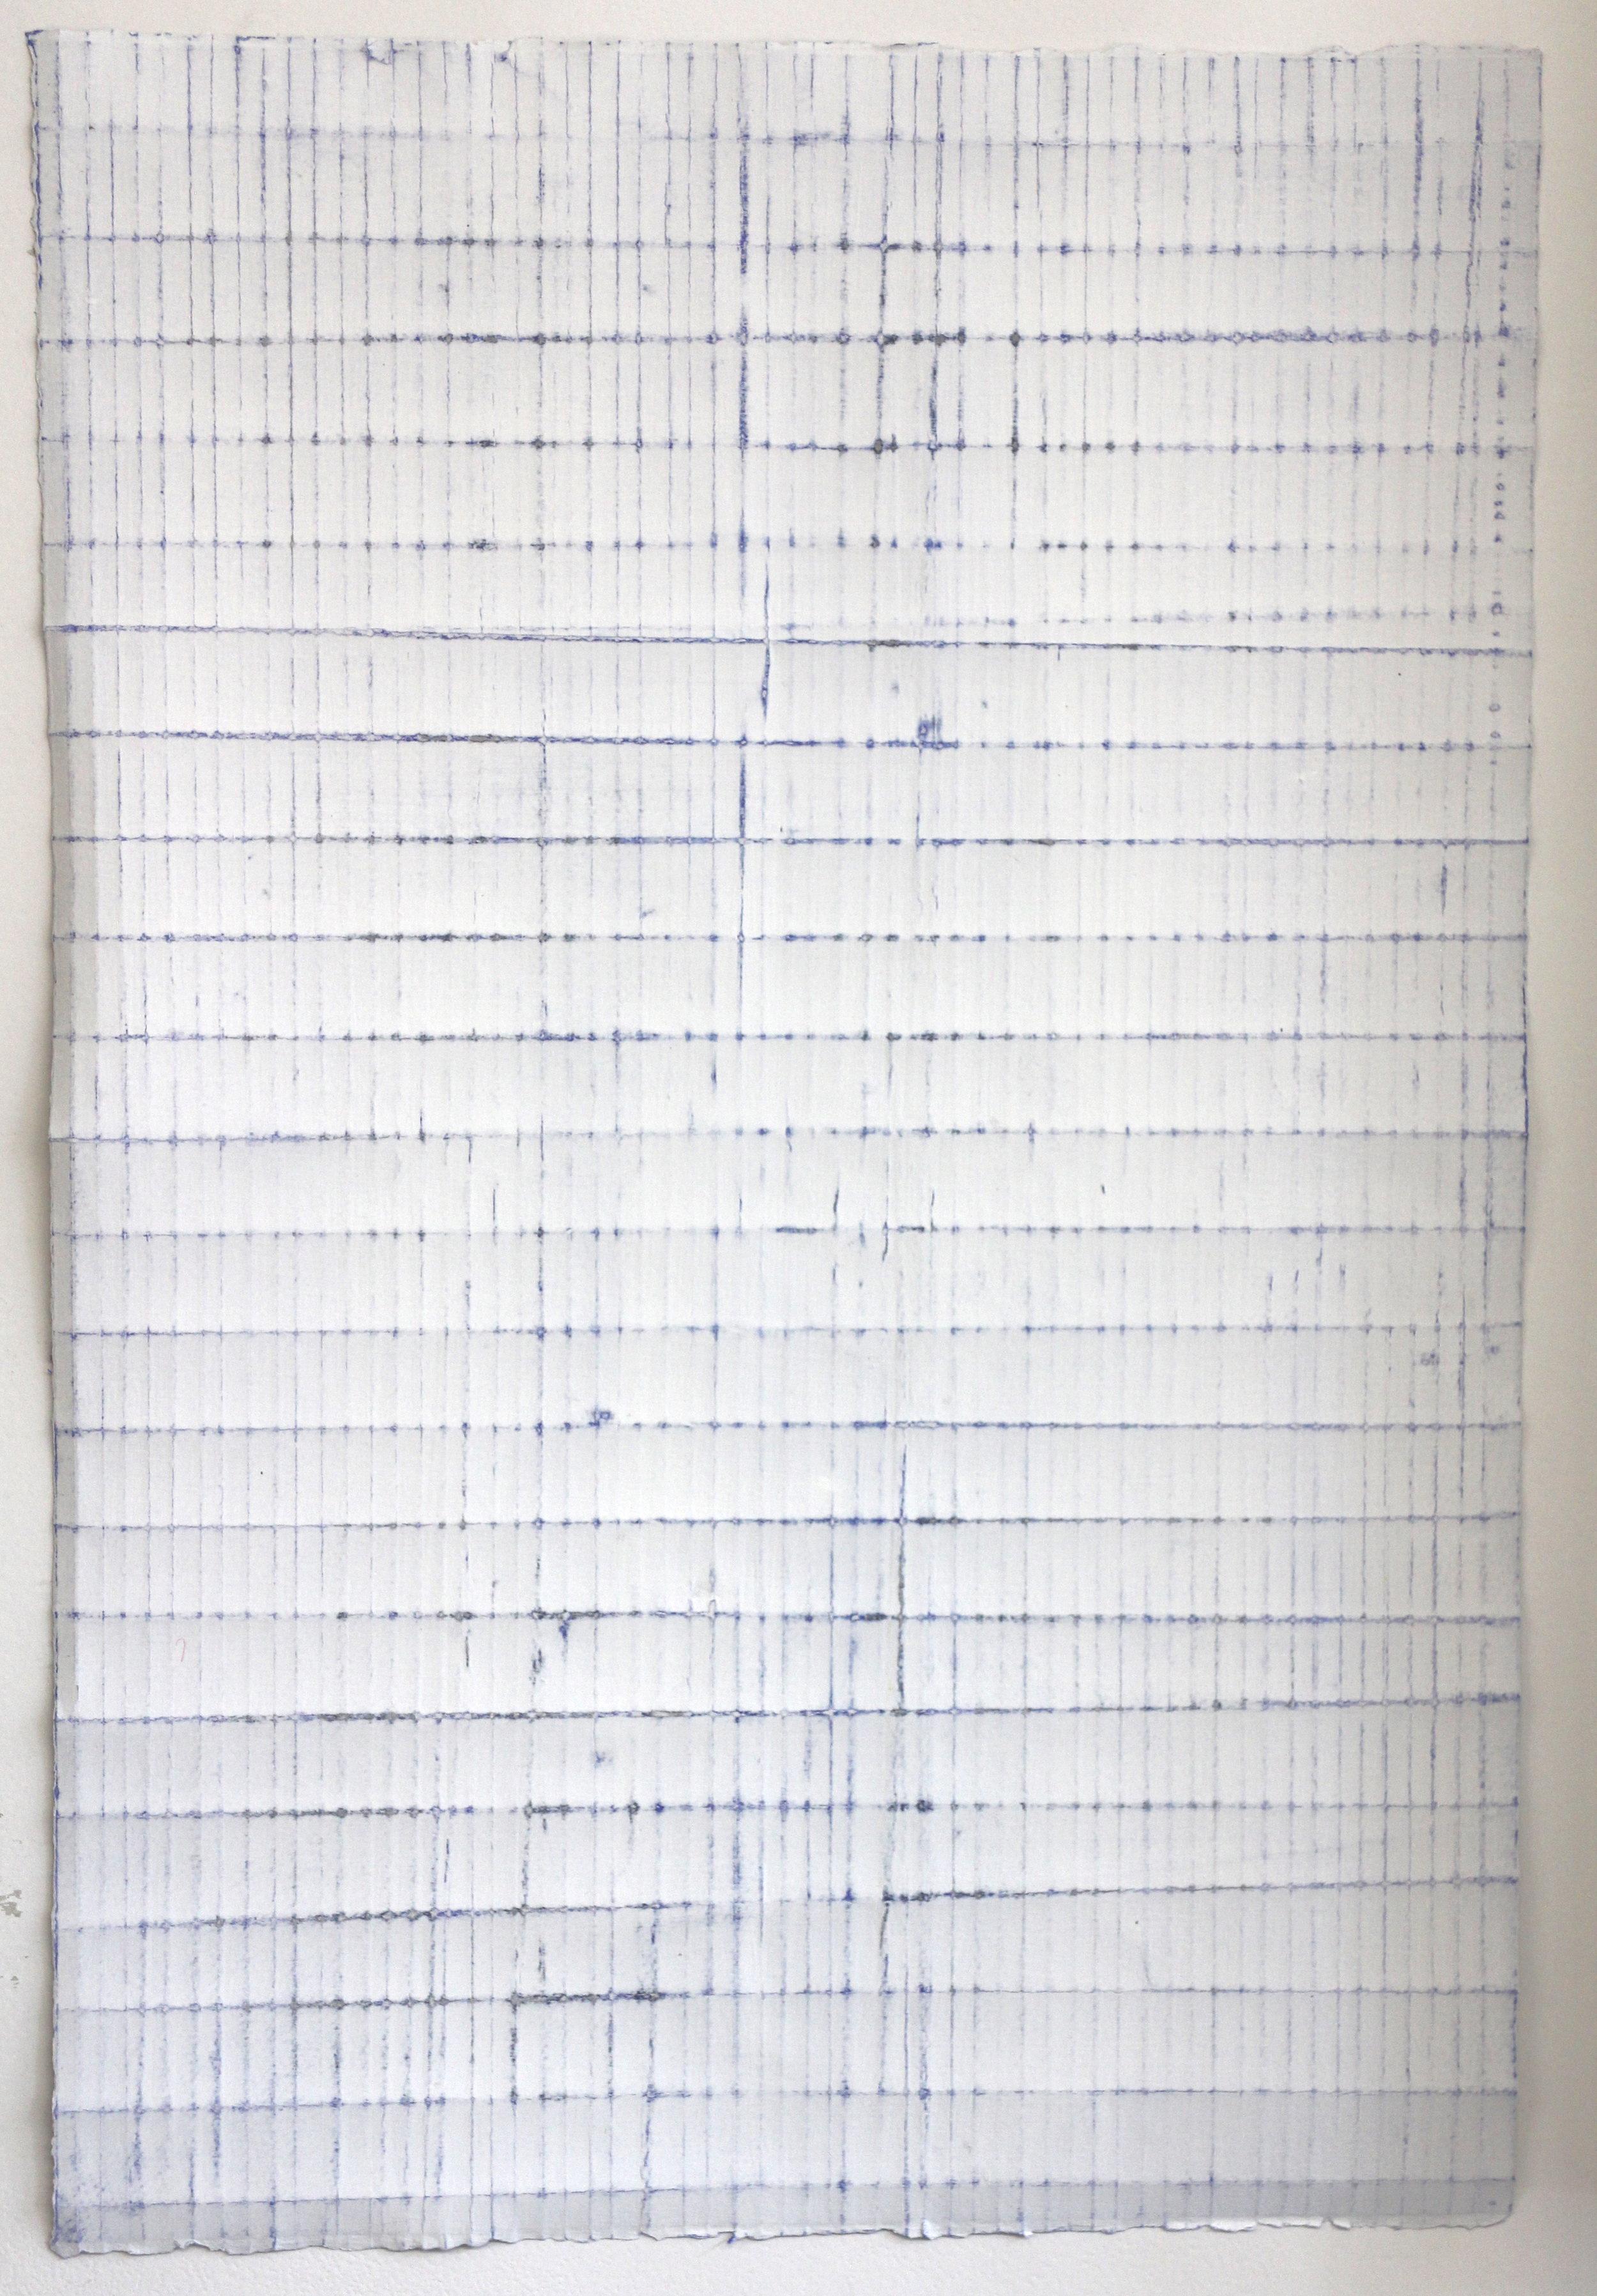 UltraBlue/White 1x1.4 4.11.19